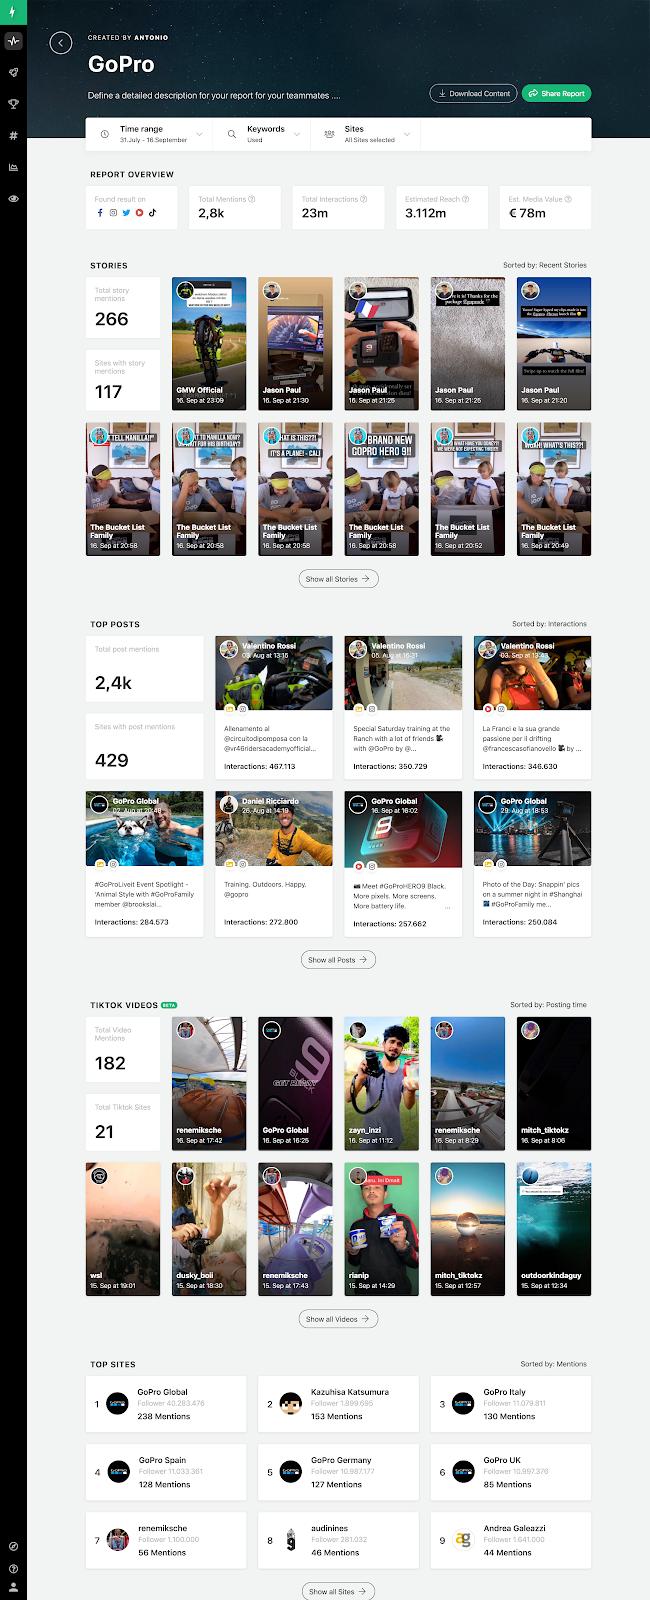 https://app.storyclash.com/monitoring/direct-link/8ab3db0a2acdd5074469d8762f94219948253e488a7495ee294033da69973a53d8137114e6b28e198a4ea85ec79840becfe211fd0ae07970bb6dd3c99f399c43